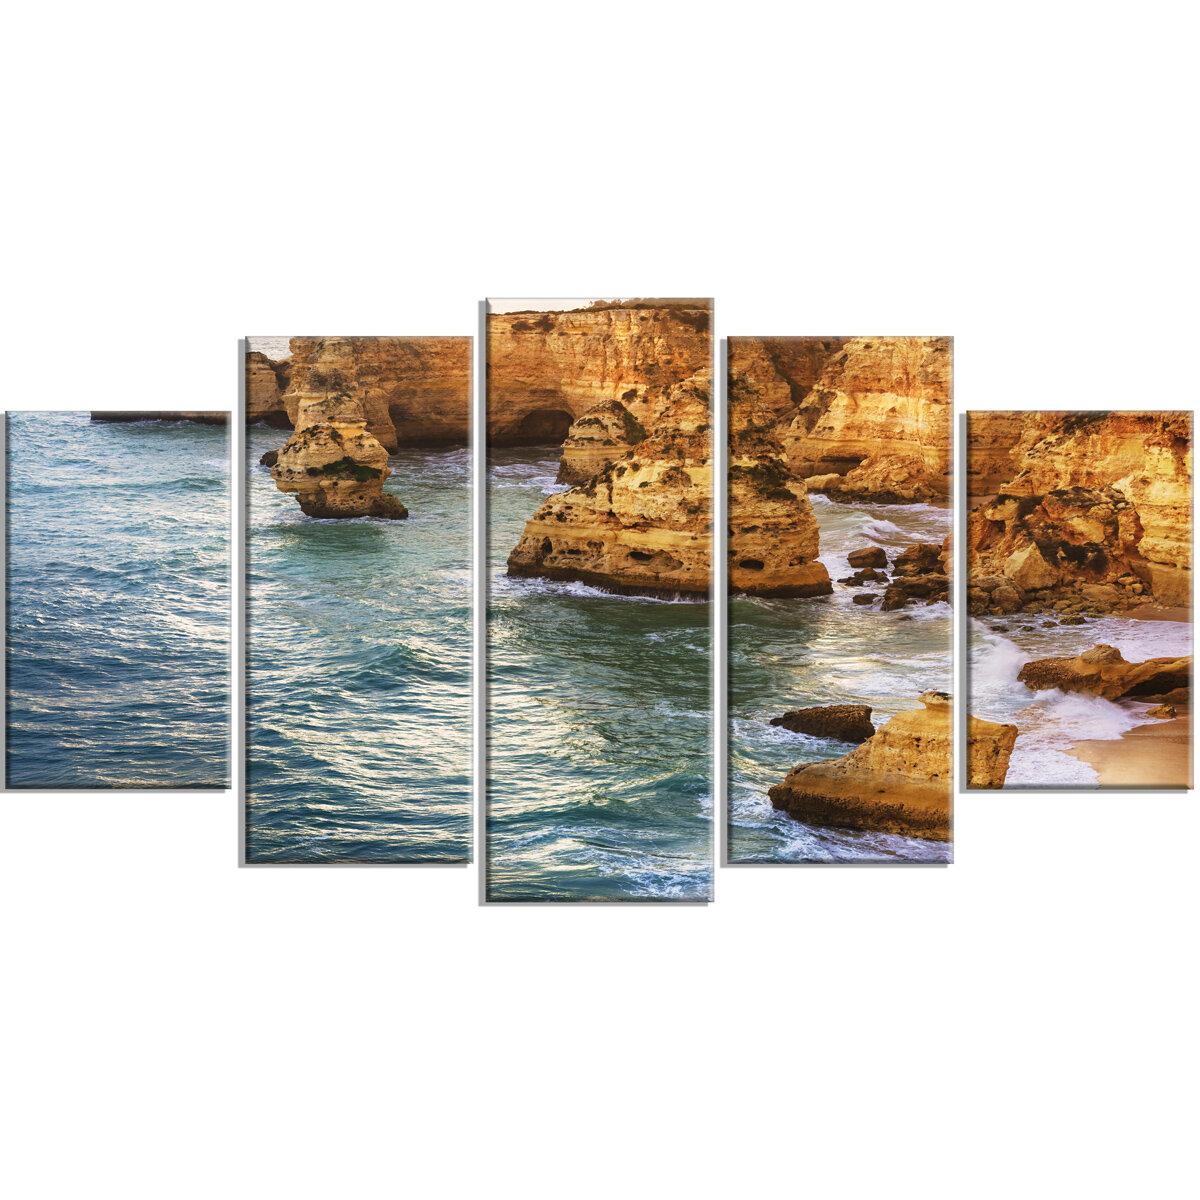 Designart Golden Rocks And Beach At Algarve 5 Piece Photographic Print On Wrapped Canvas Set Wayfair